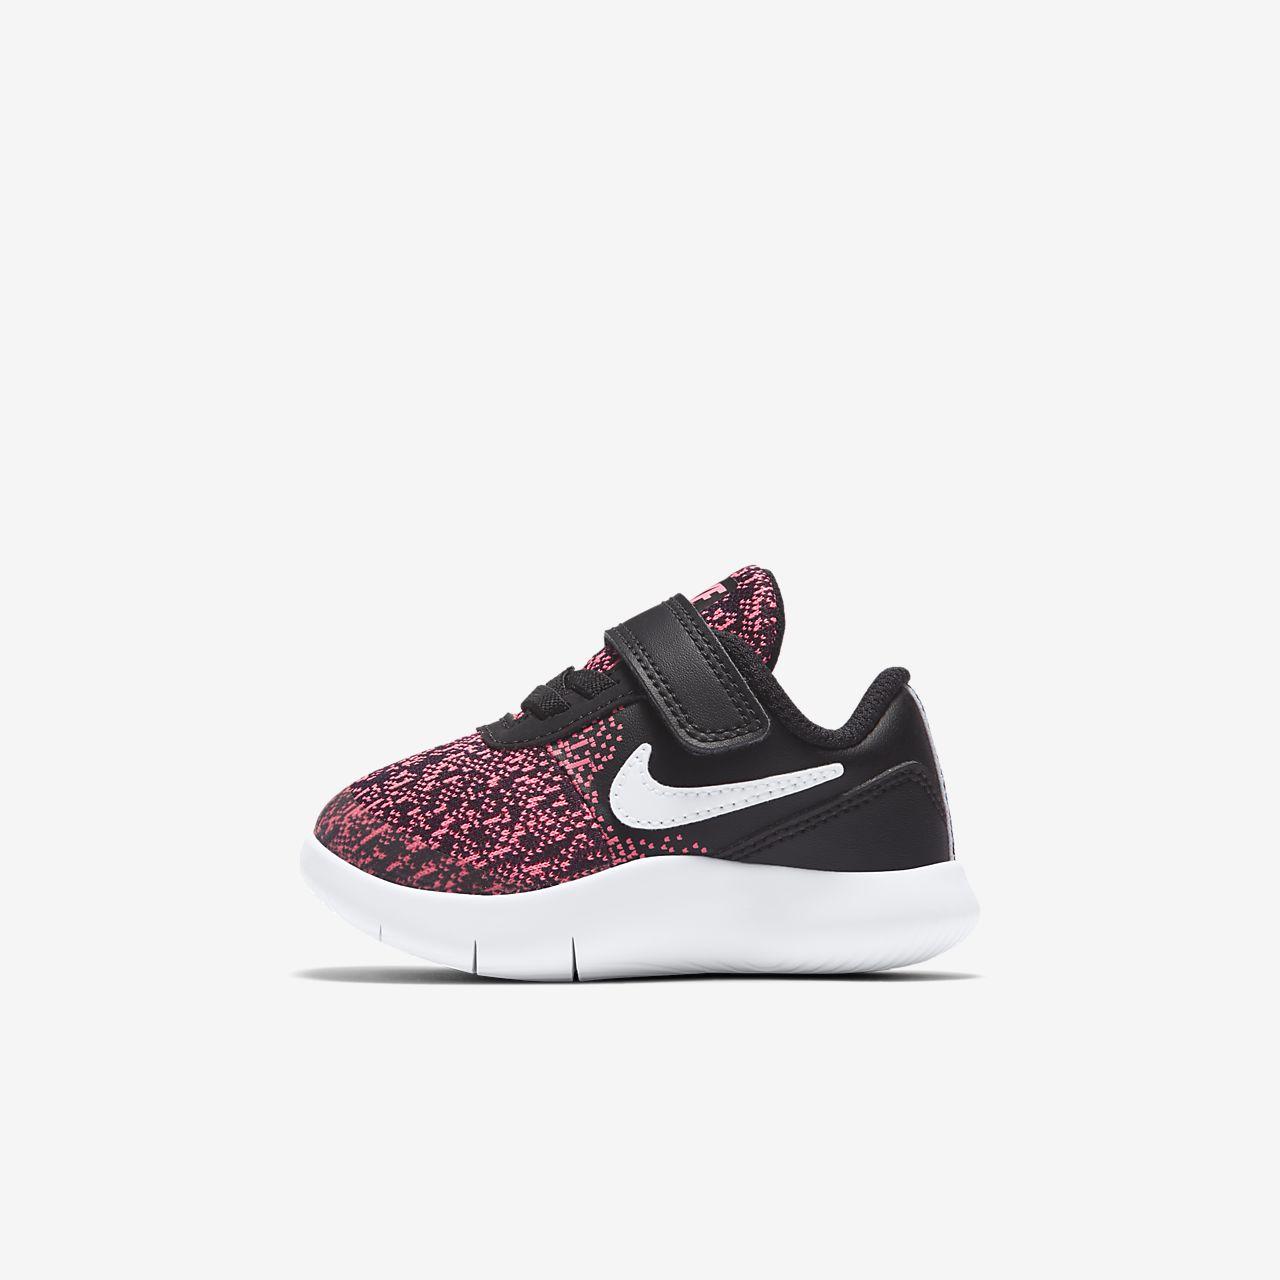 Nike Id Flyknit Gratuit Uk Bébé